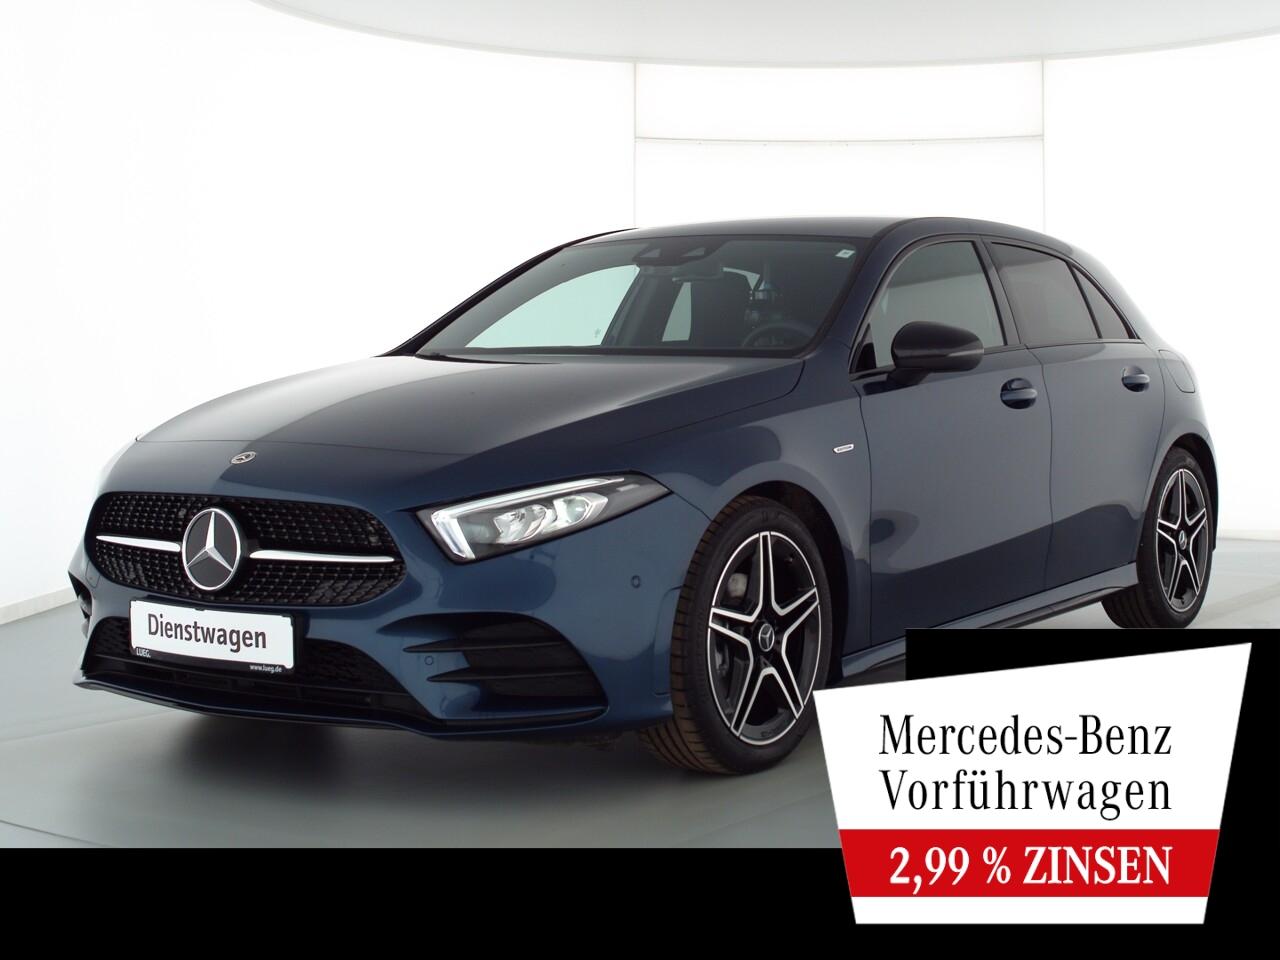 Mercedes-Benz A 180 EDITION2020+AMG+NIGHT+MBUX-HIGH-END+KAM., Jahr 2021, Benzin